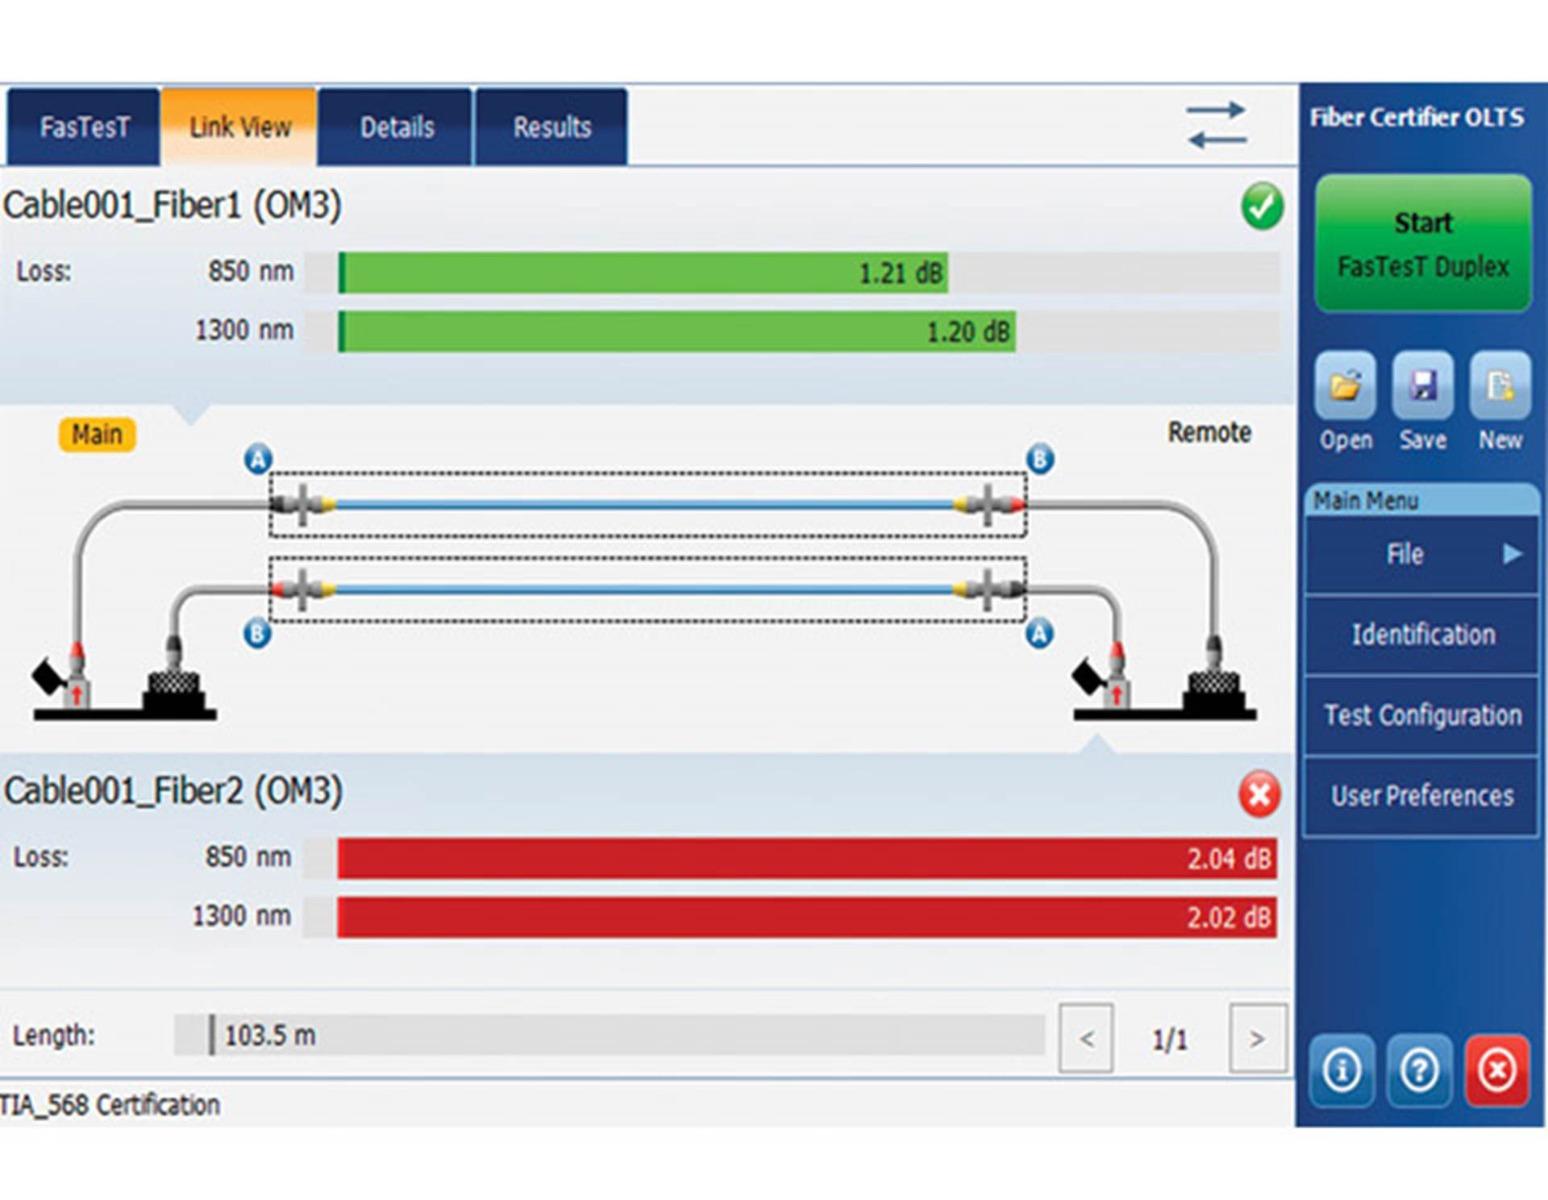 EXFO FTBx-945 Fiber Certifier OLTS